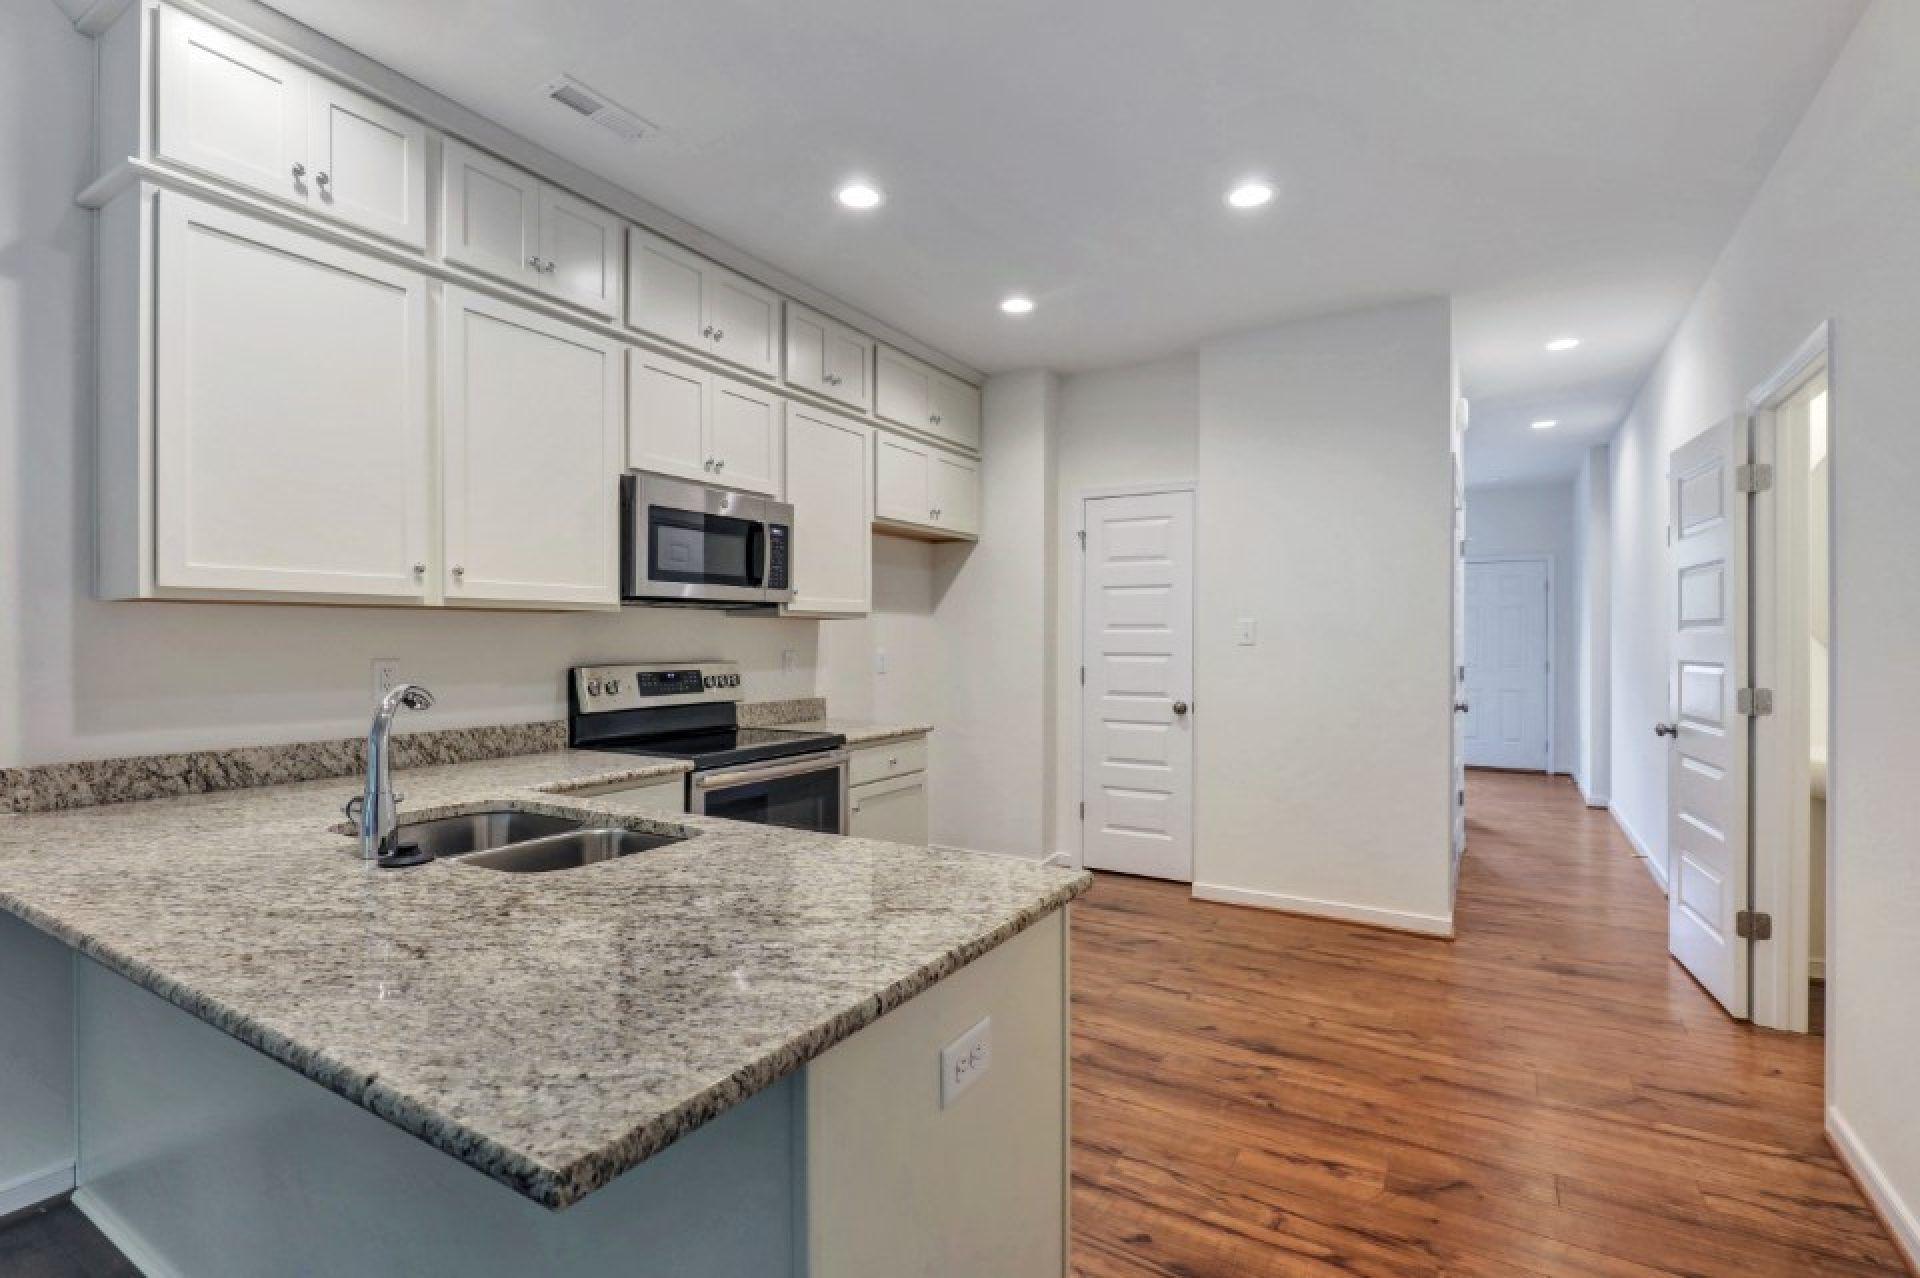 Kitchen featured in the Belmont By HHHunt Homes LLC in Richmond-Petersburg, VA